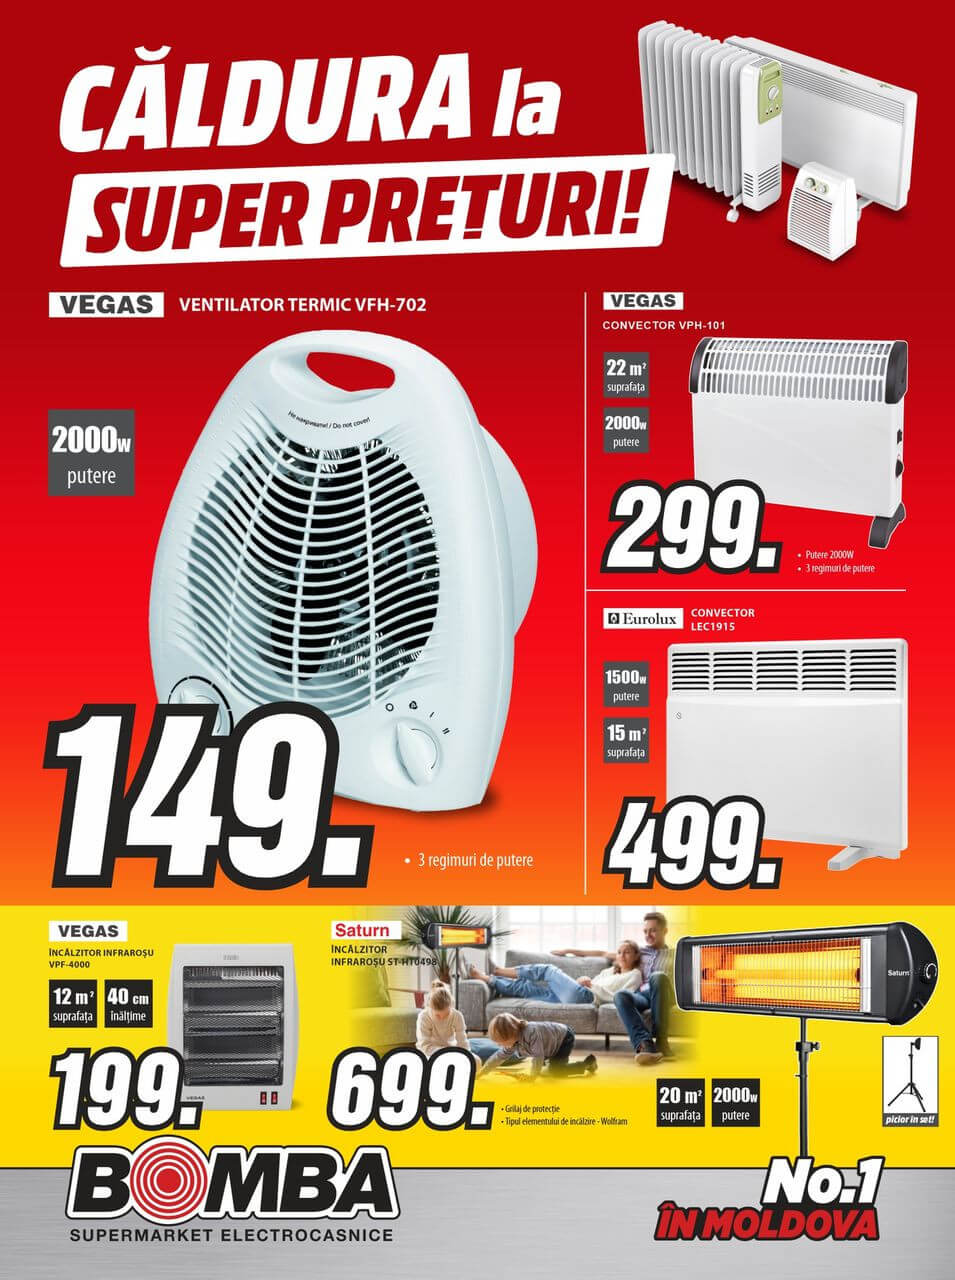 Bomba: Тепло по супер ценам